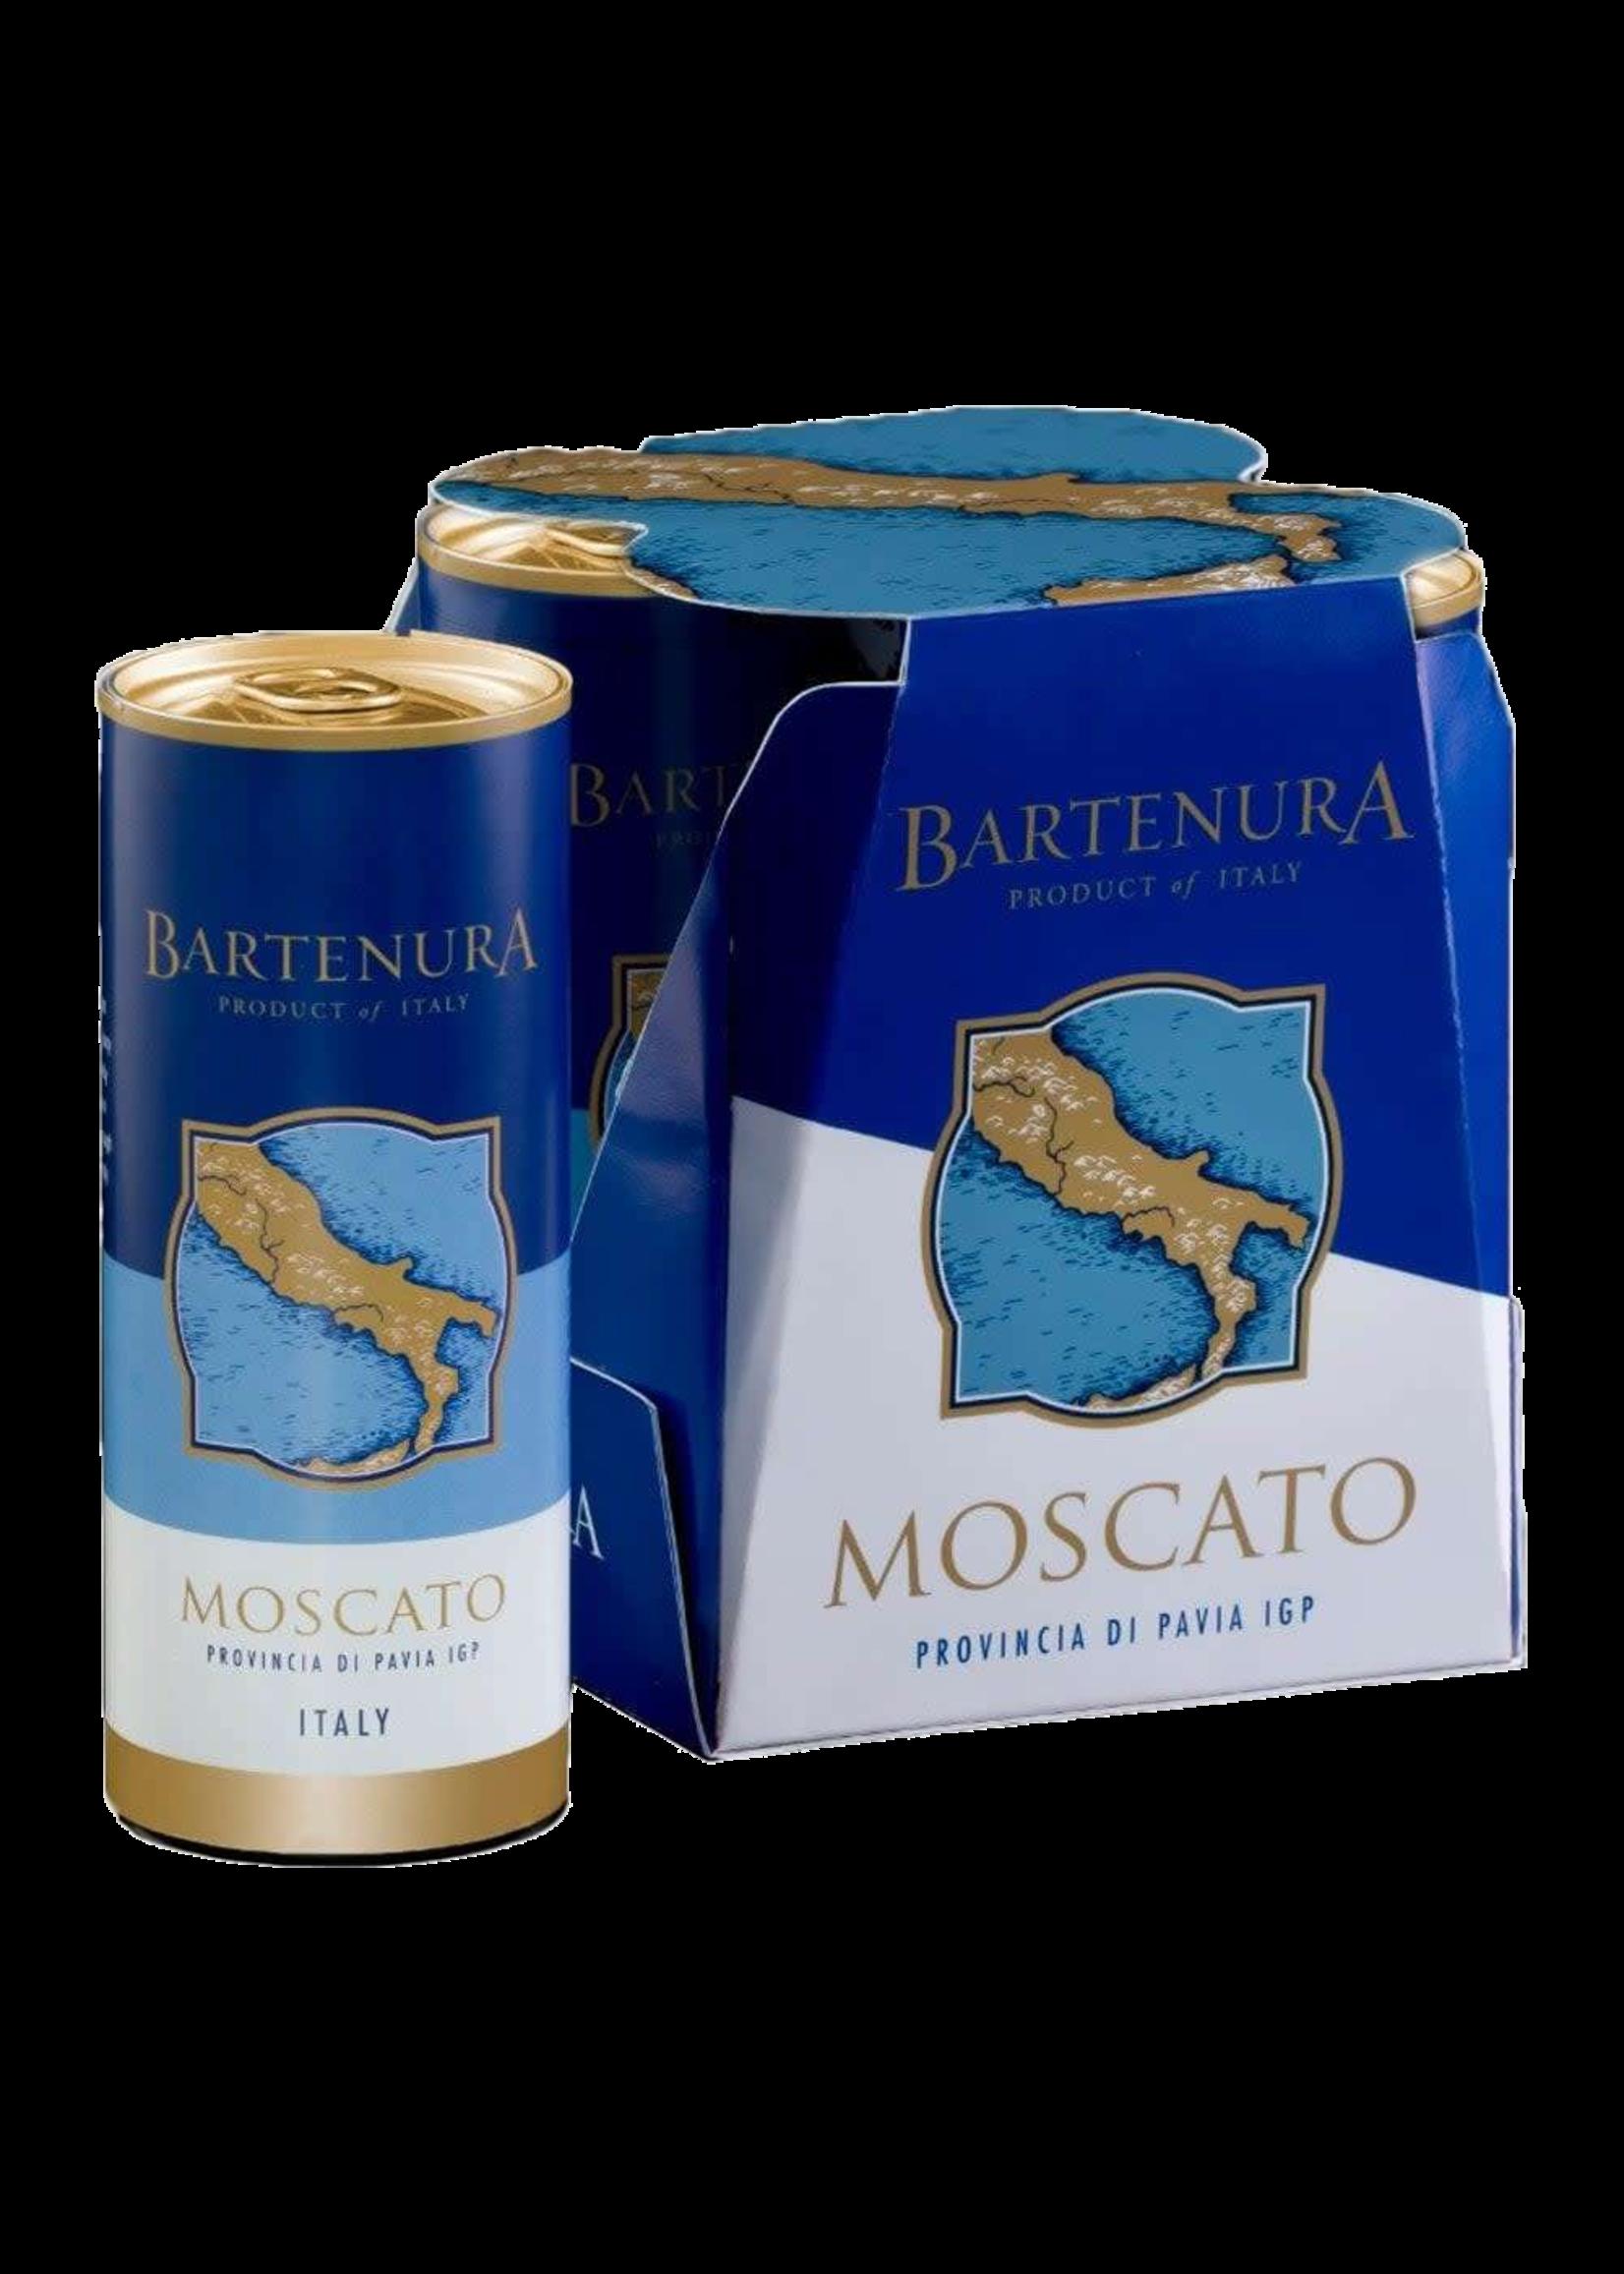 Bartenura Bartenura Moscato / 4 PACK x 250mL